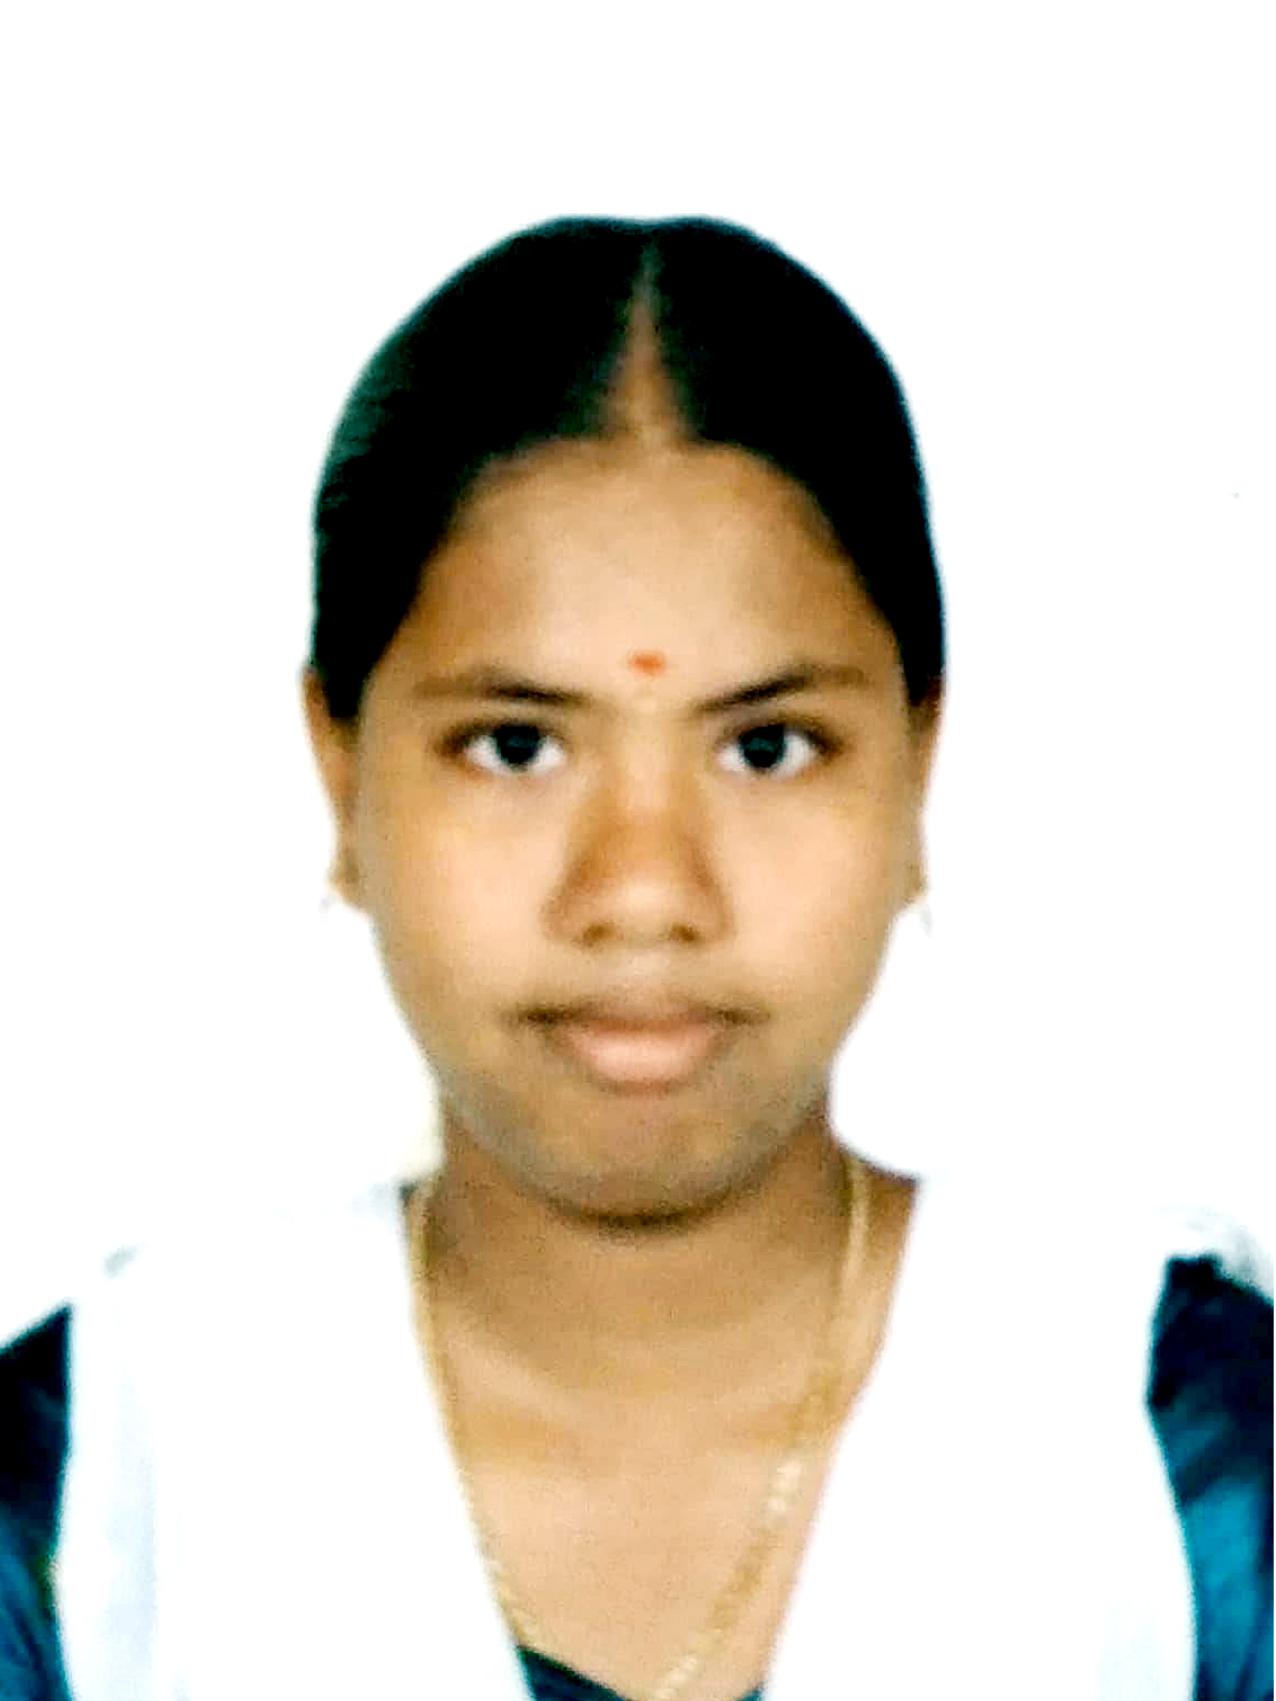 Pavithra M(211301878)BCA-April 2016-Rank 10